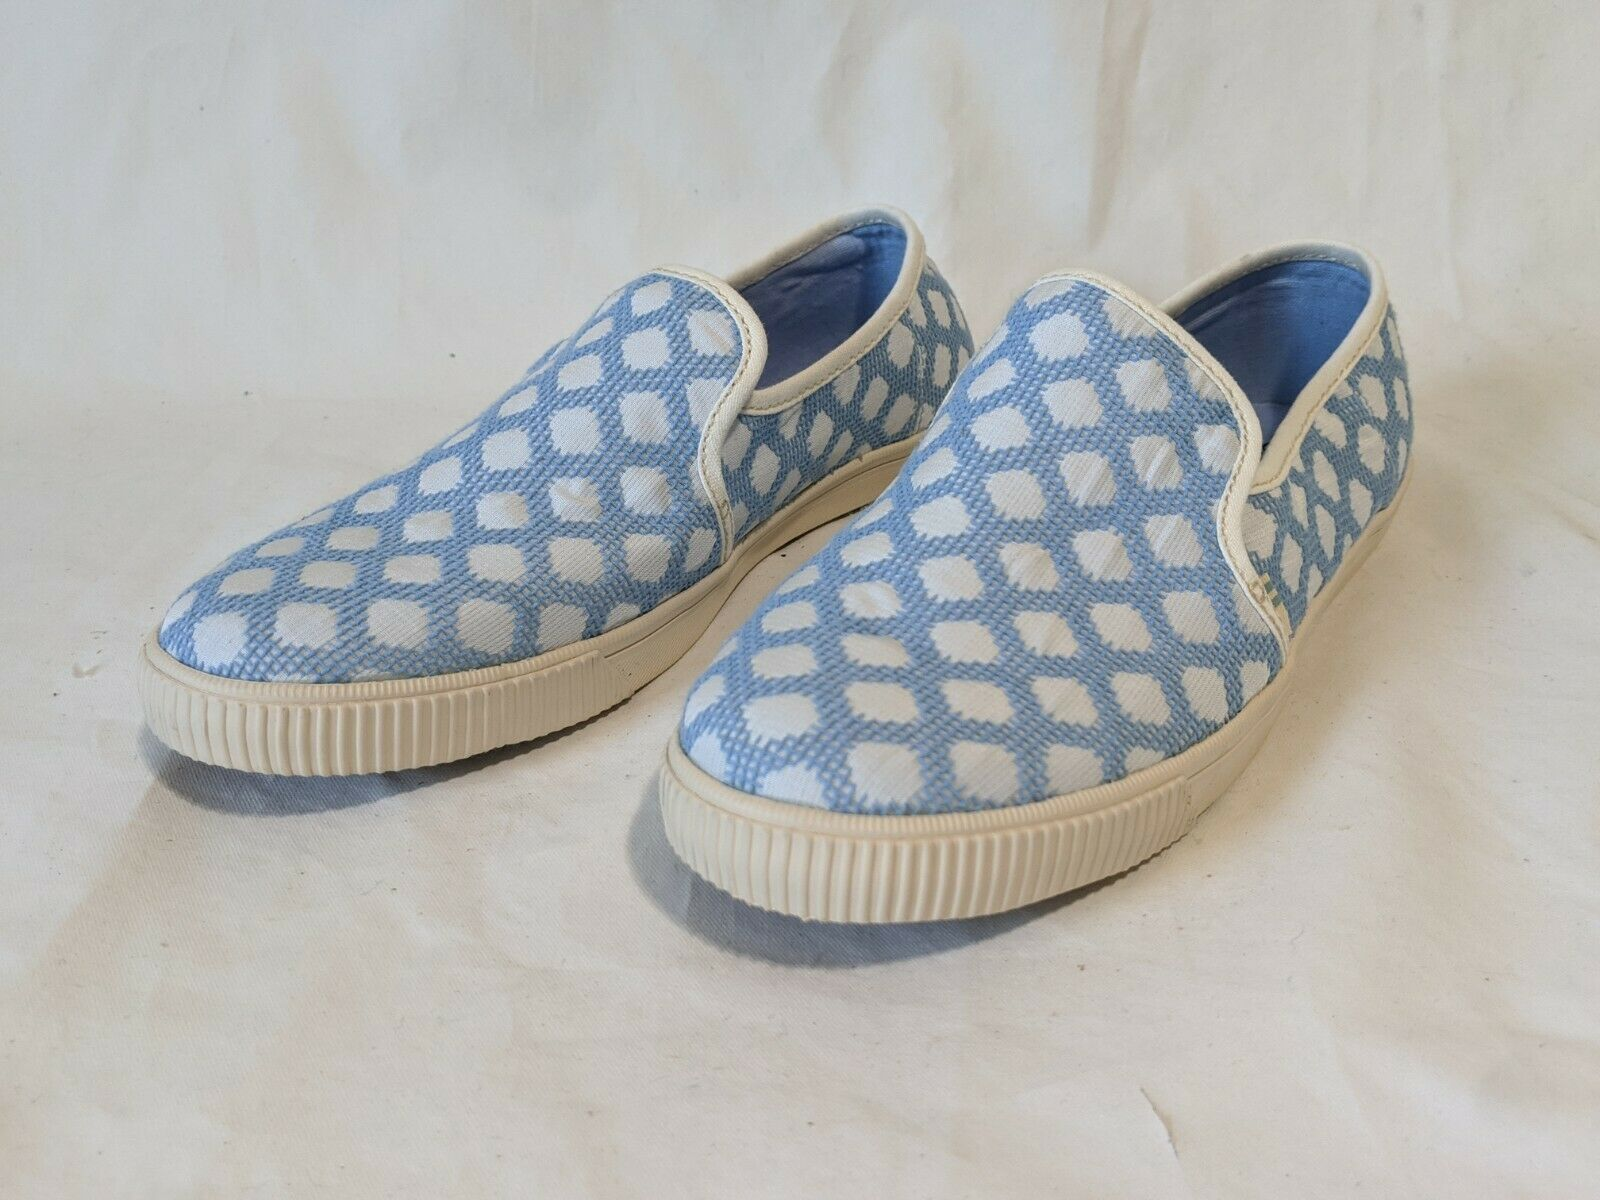 TOMS Women's Clemente Bliss Blue Large Dots Slip-On Topanga Shoes